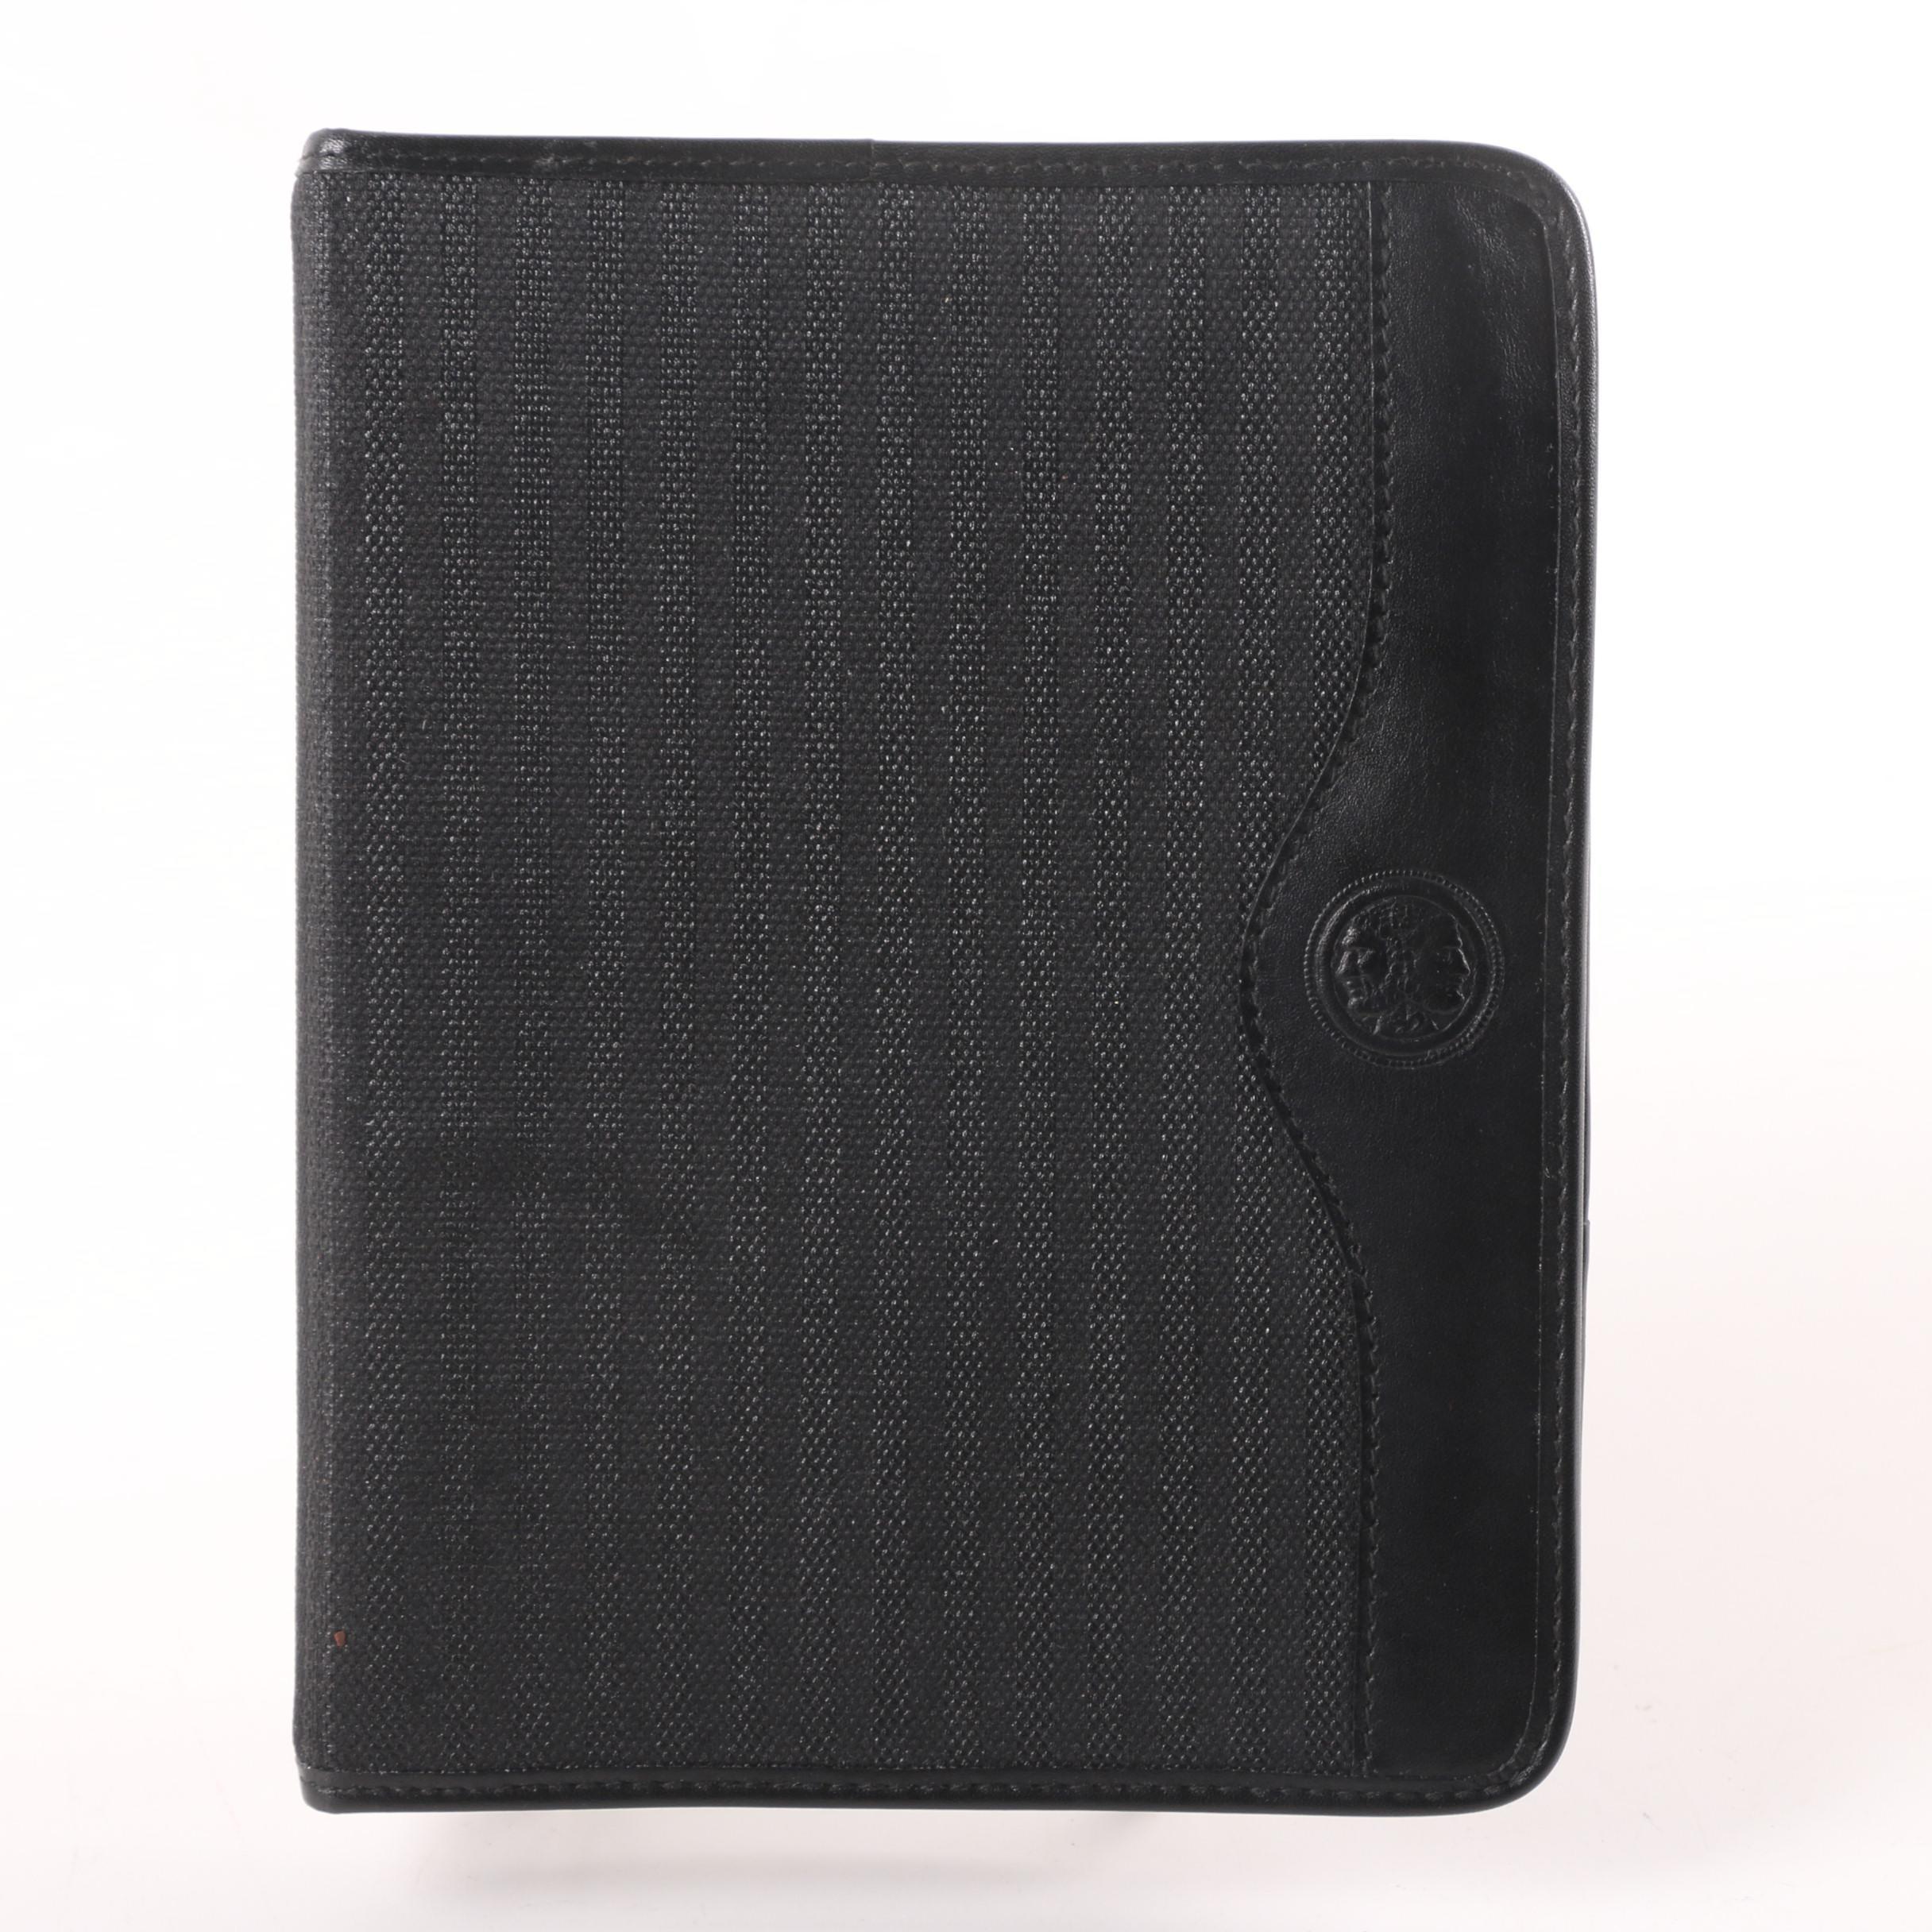 Fendi Black Striped Address Book